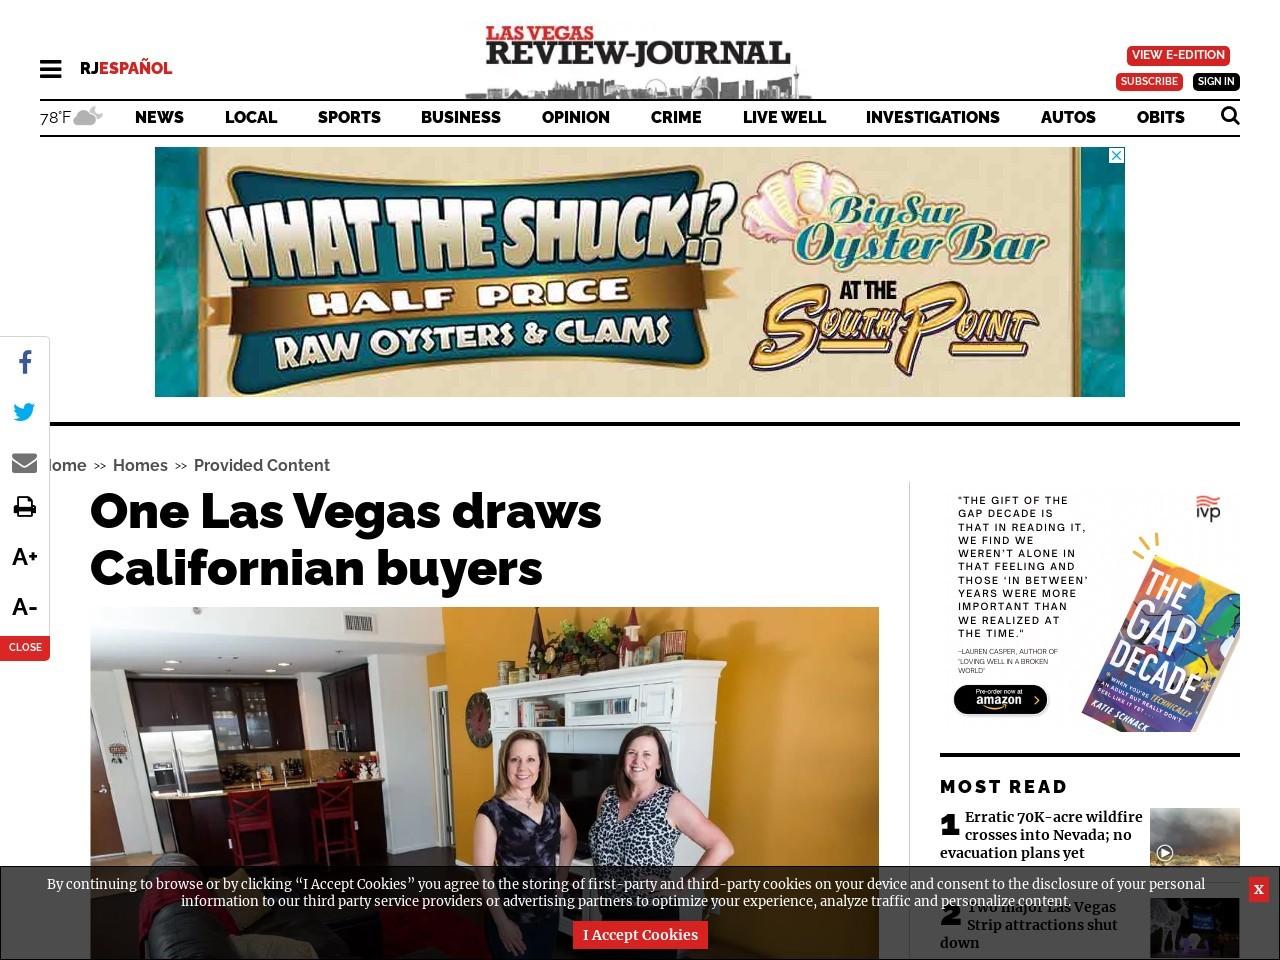 One Las Vegas draws Californian buyers